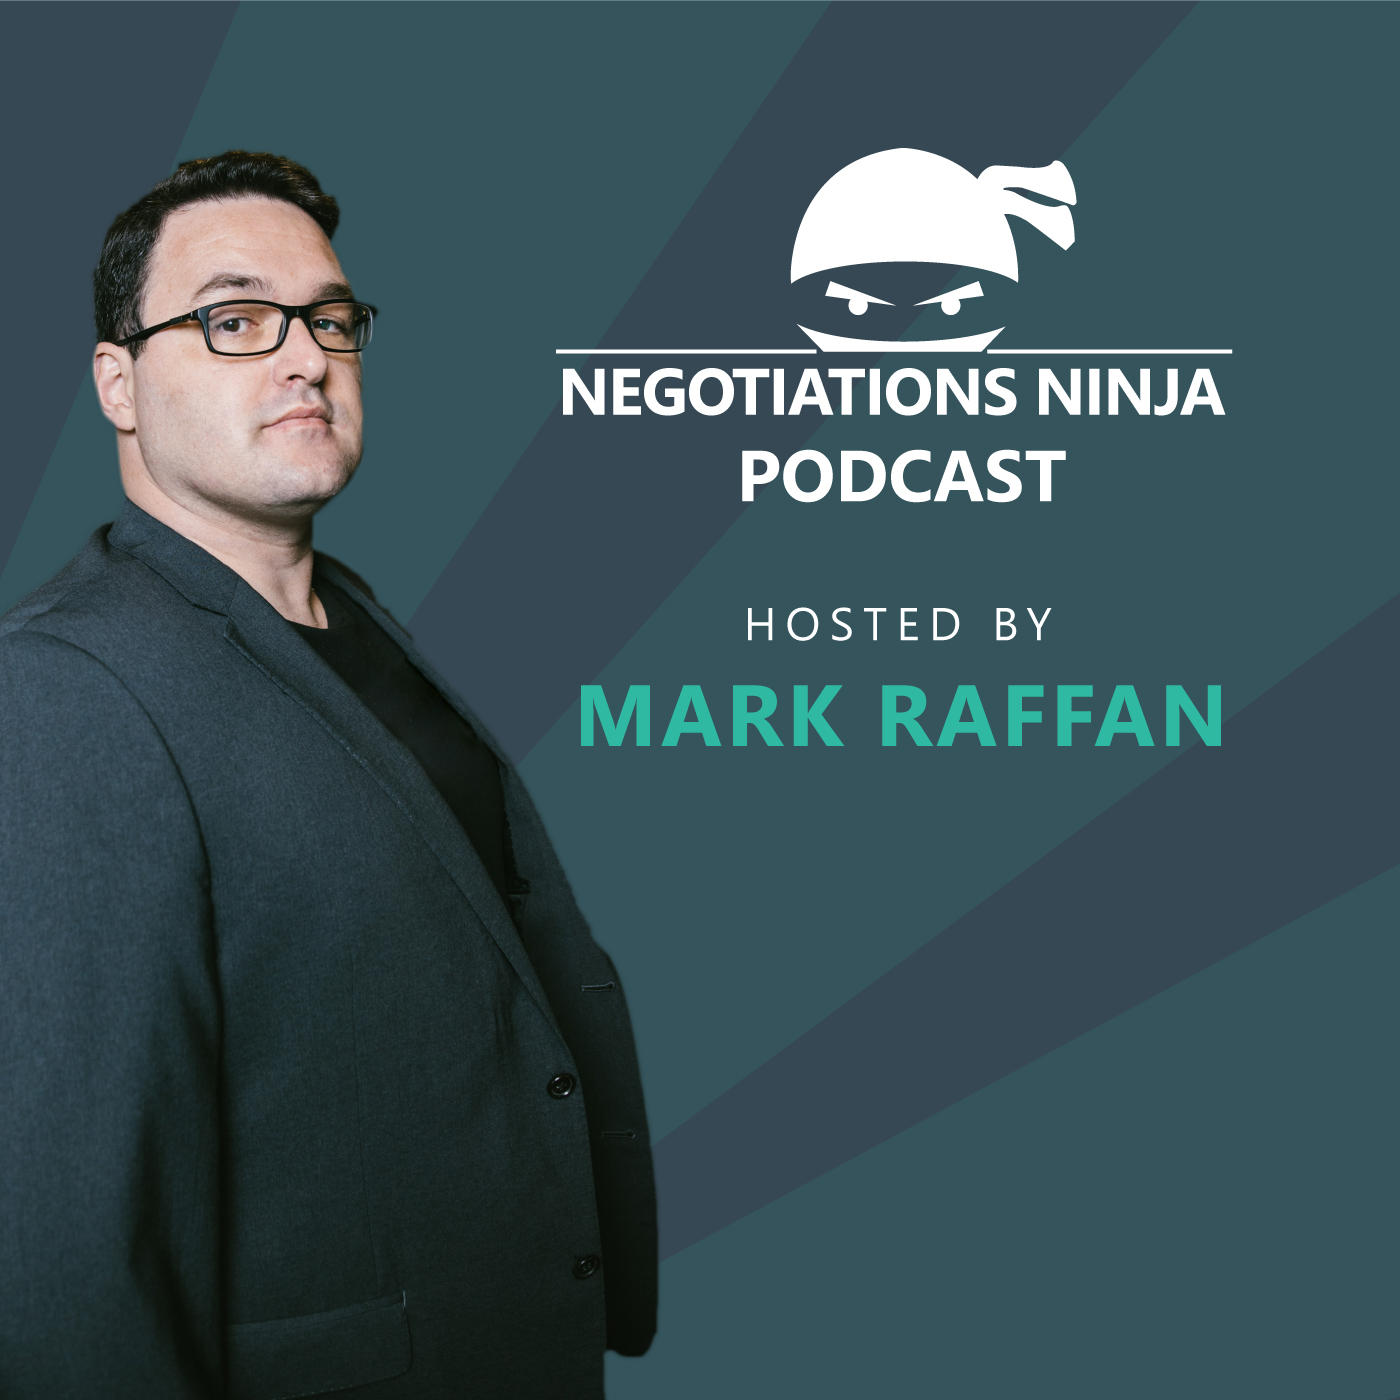 Negotiations Ninja Podcast show art